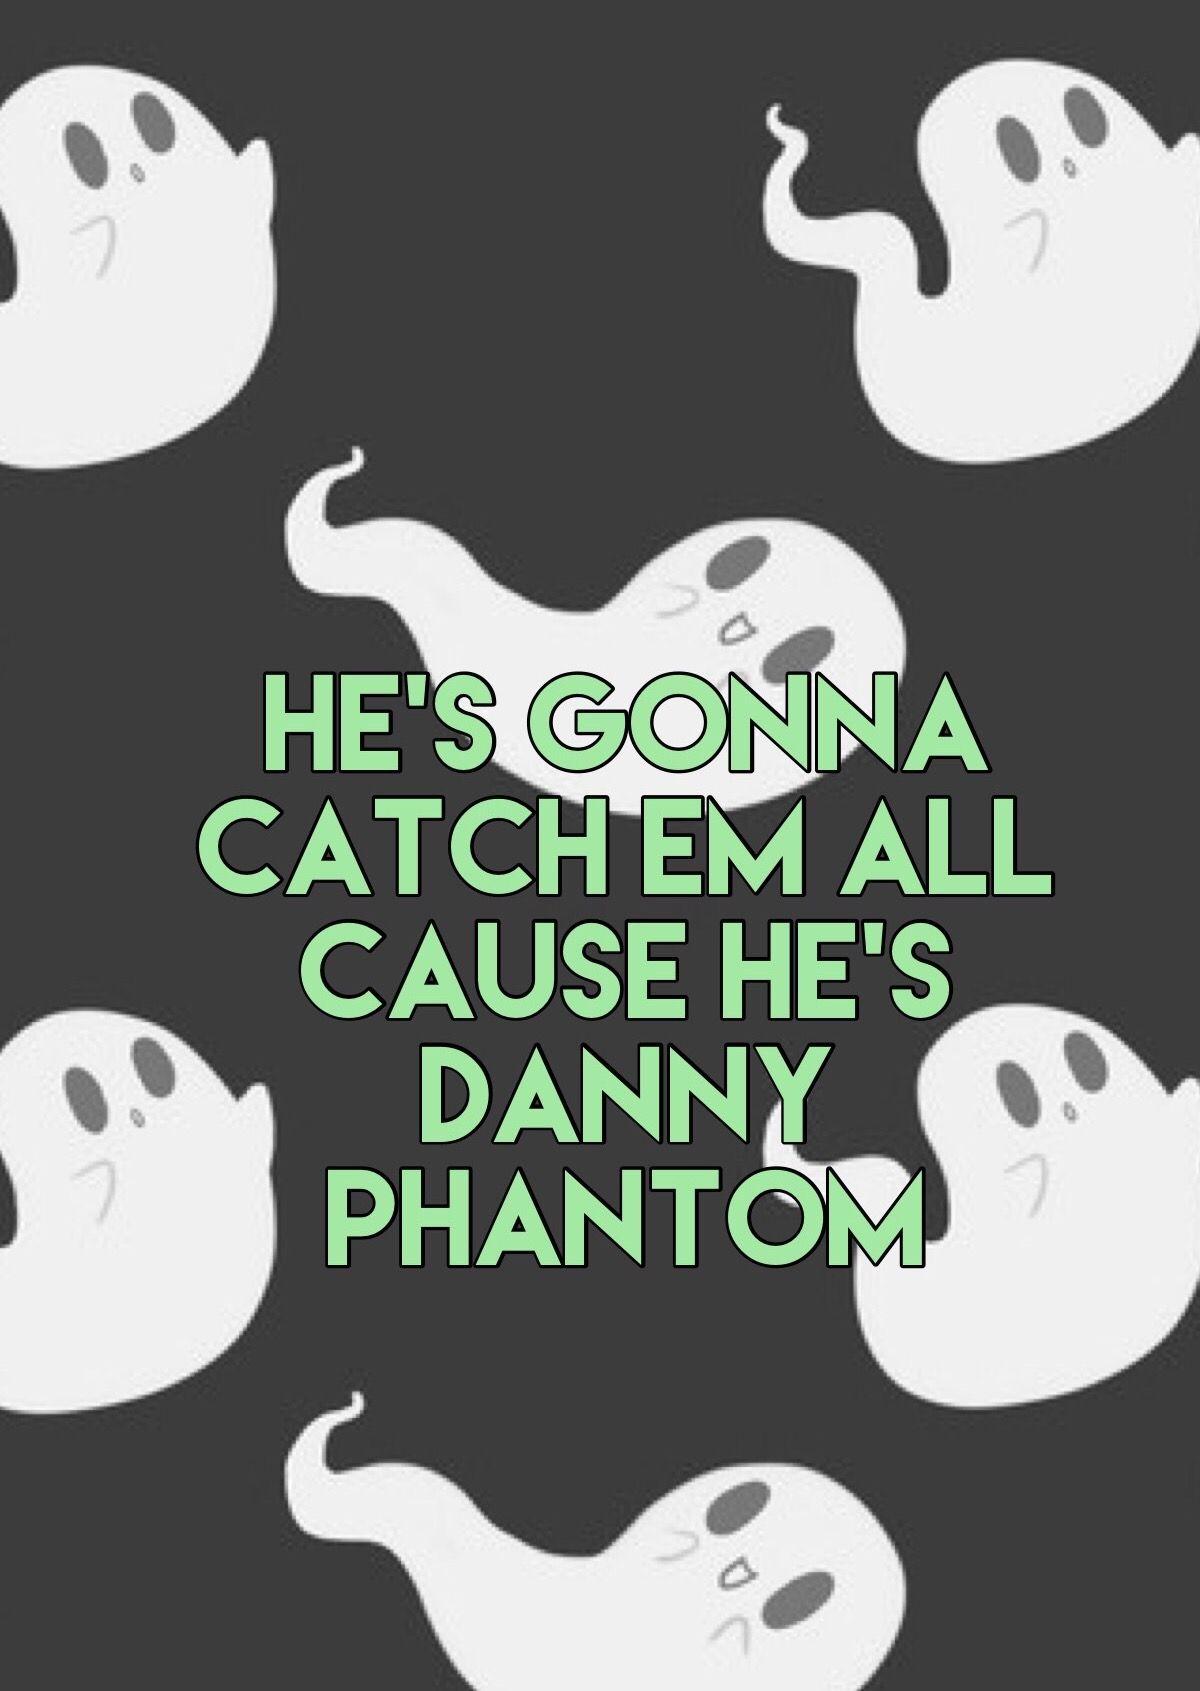 Danny Phantom Theme Song Nickelodeon DannyPhantom Wallpapers LyricWallpapers Lyrics Oldnickshows